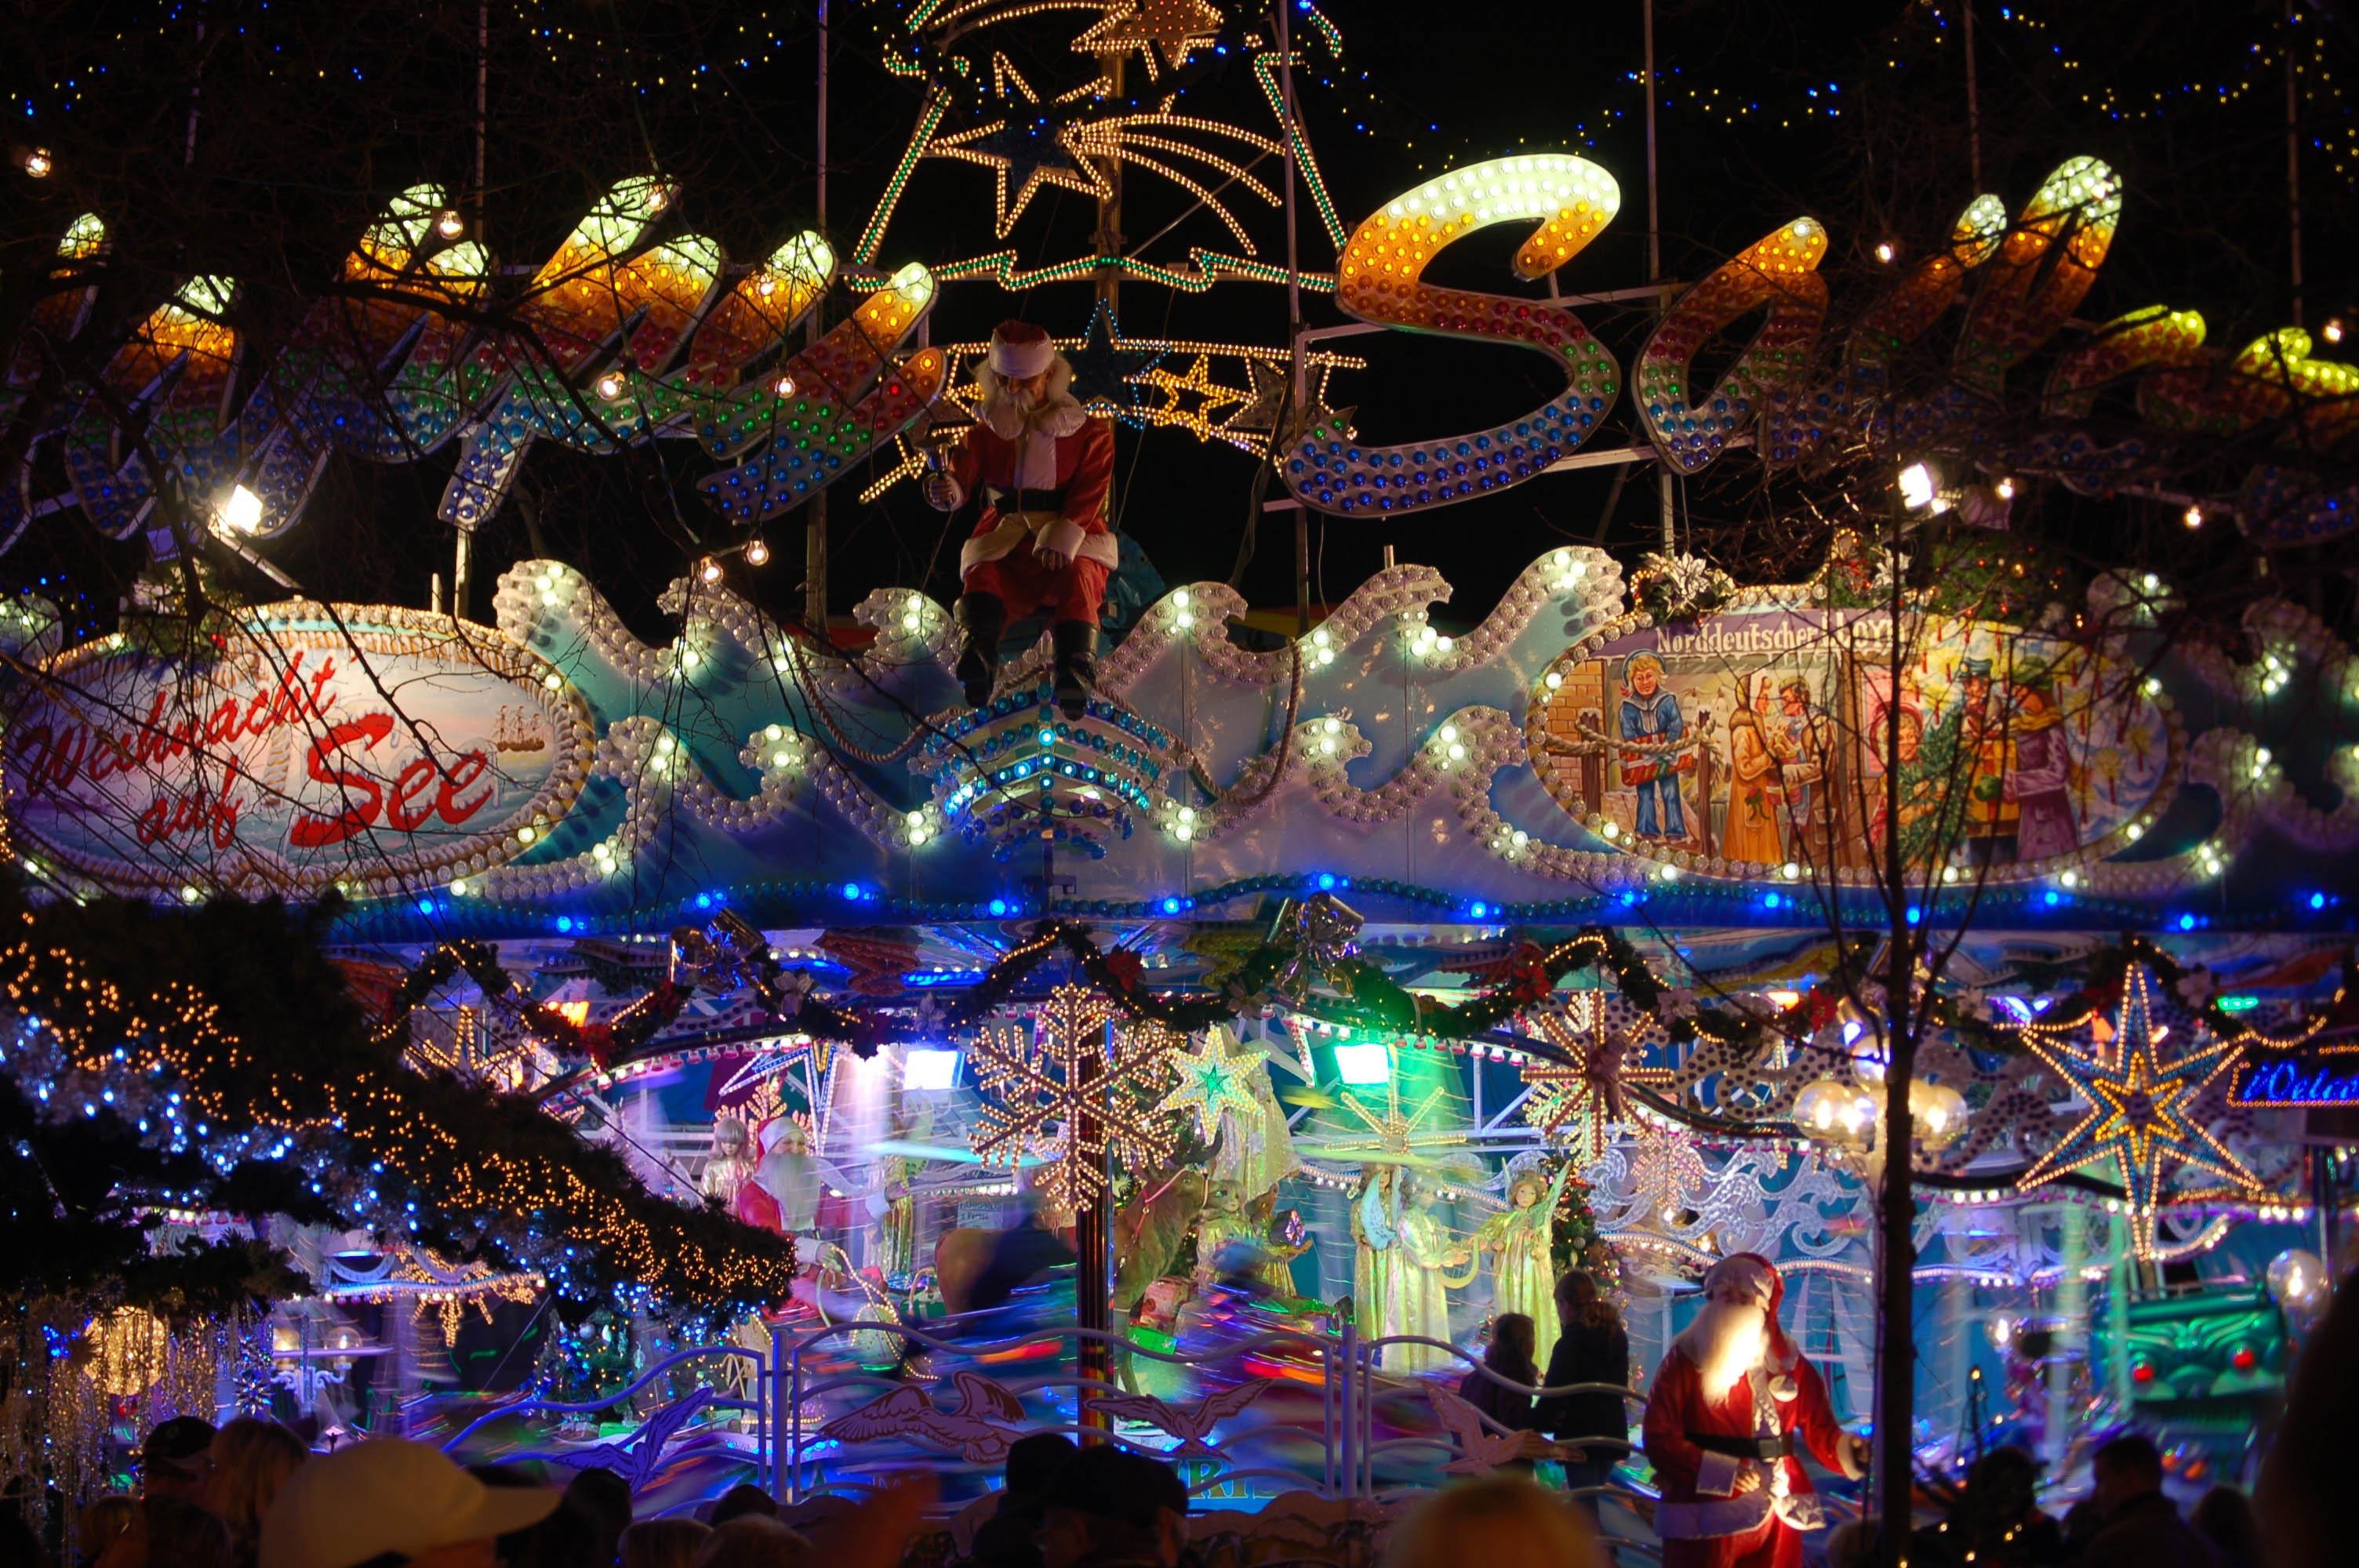 free images night city recreation carnival amusement park